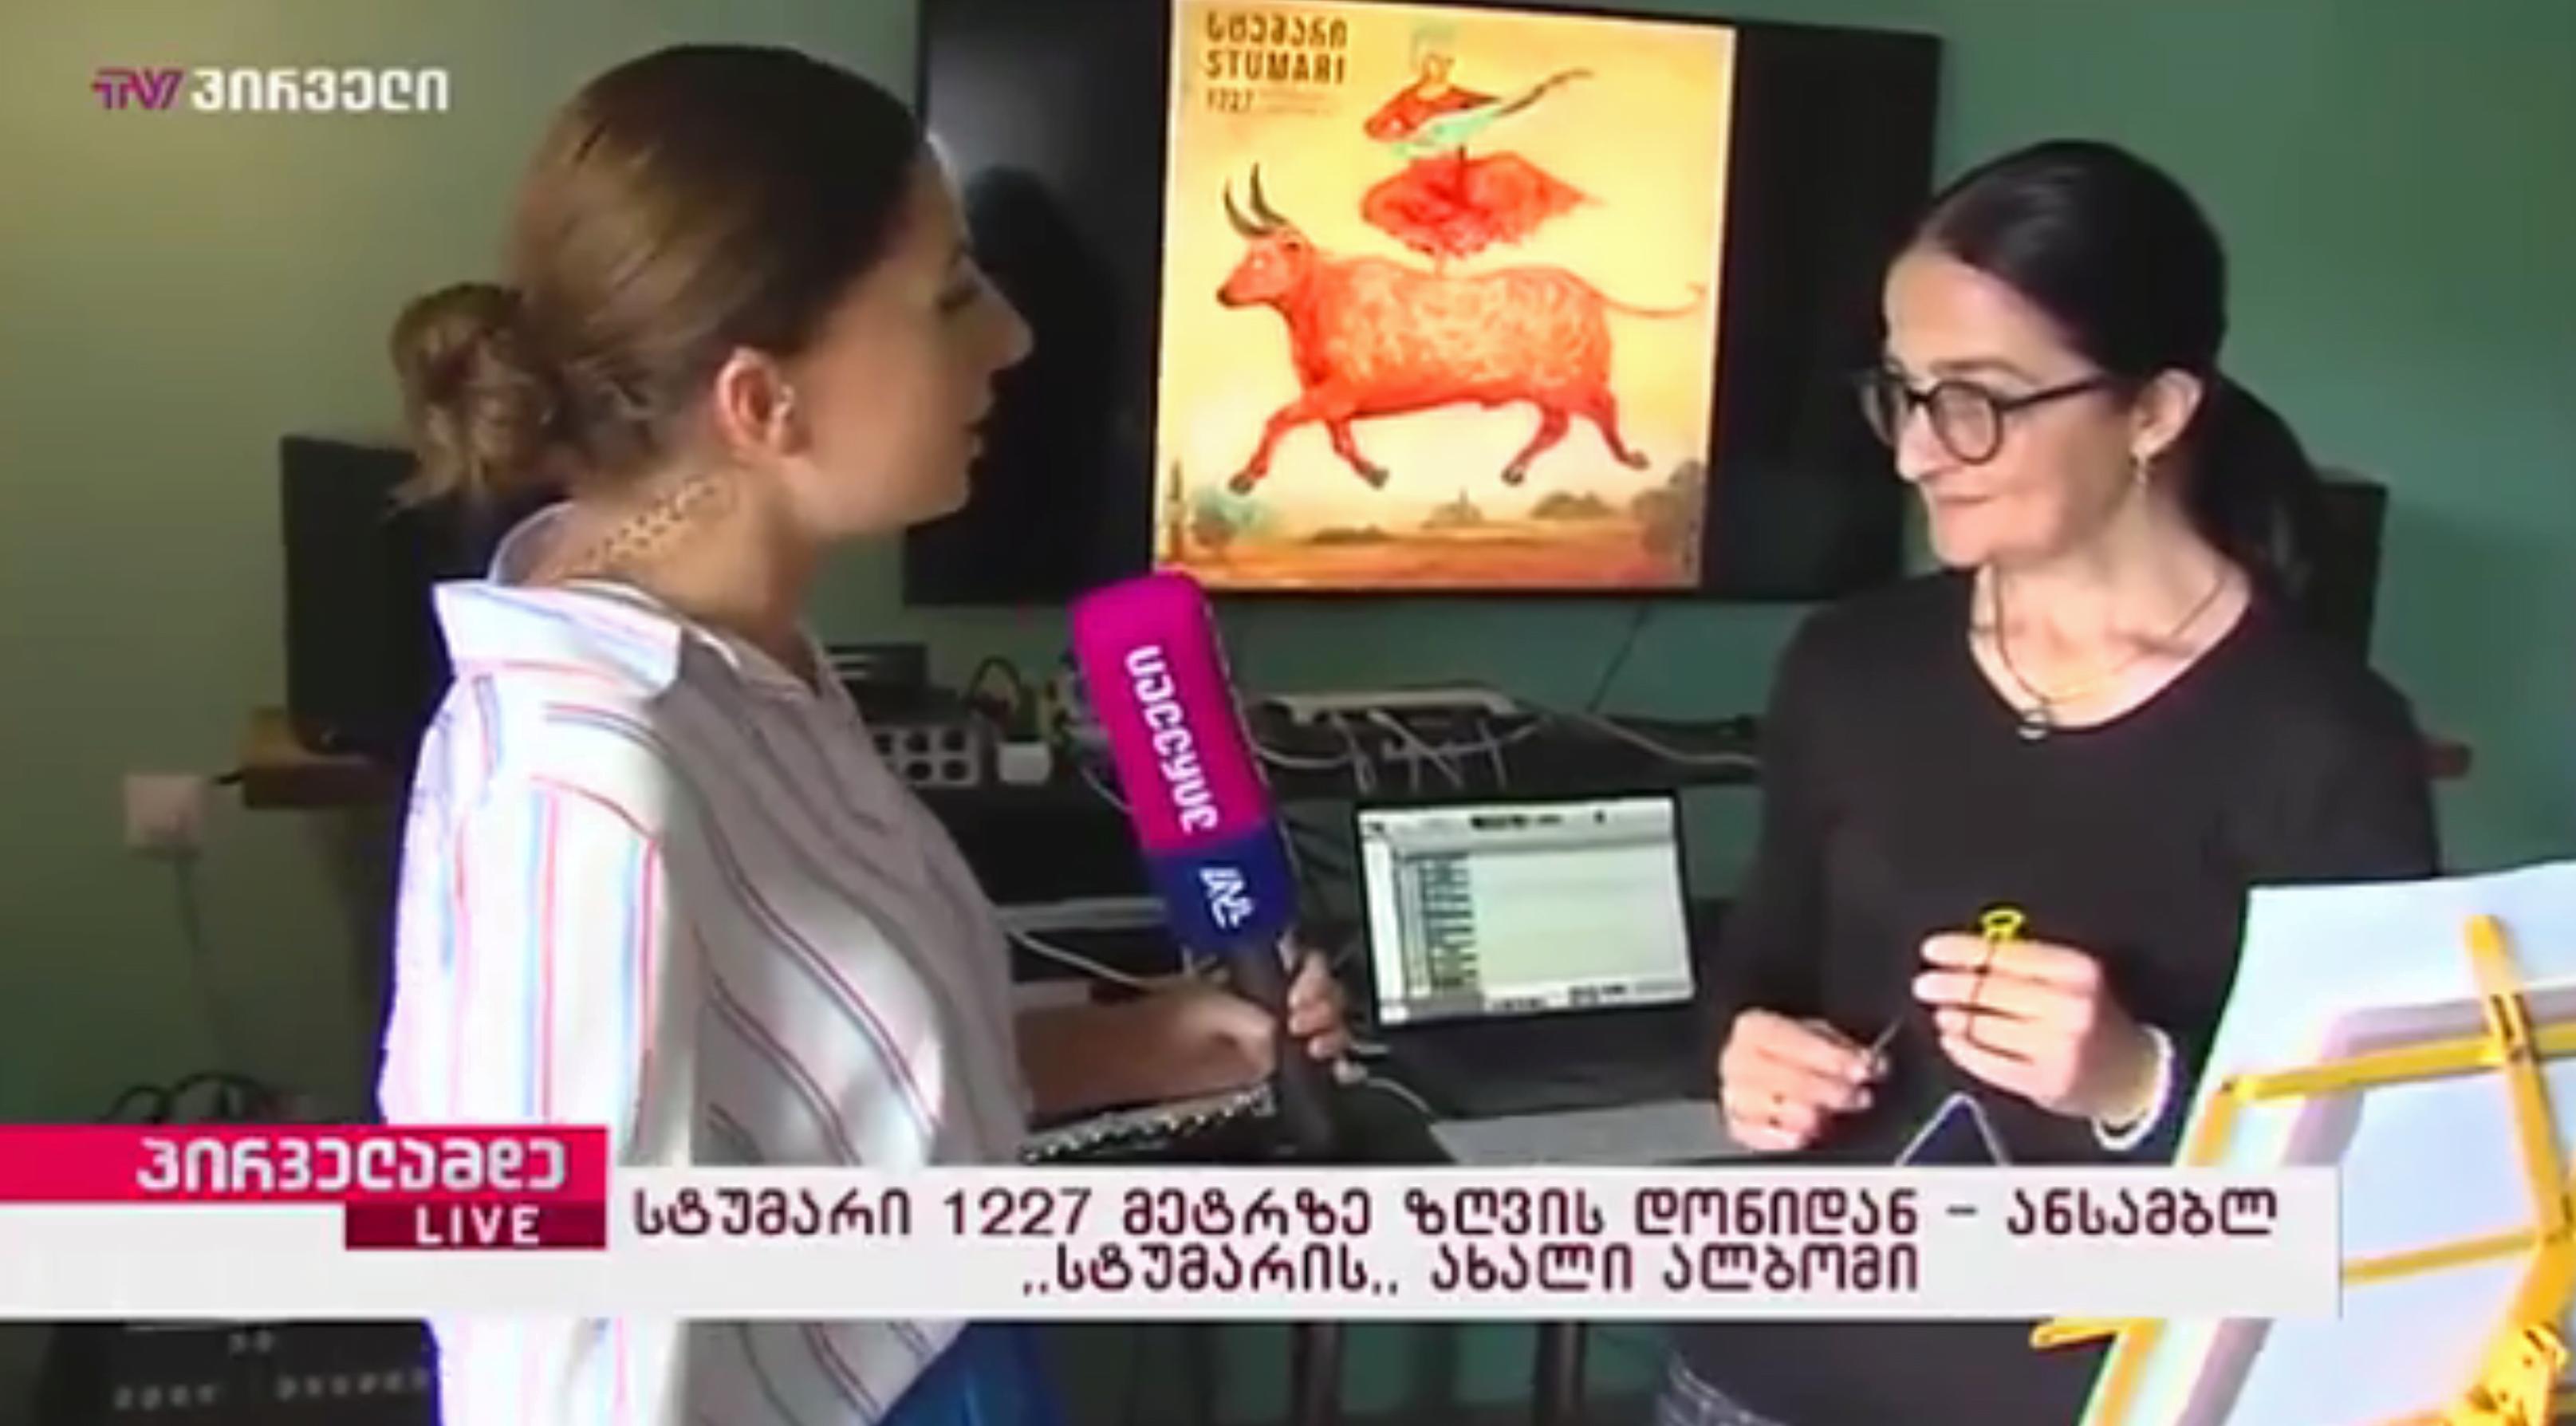 Live on Georgian TV 1